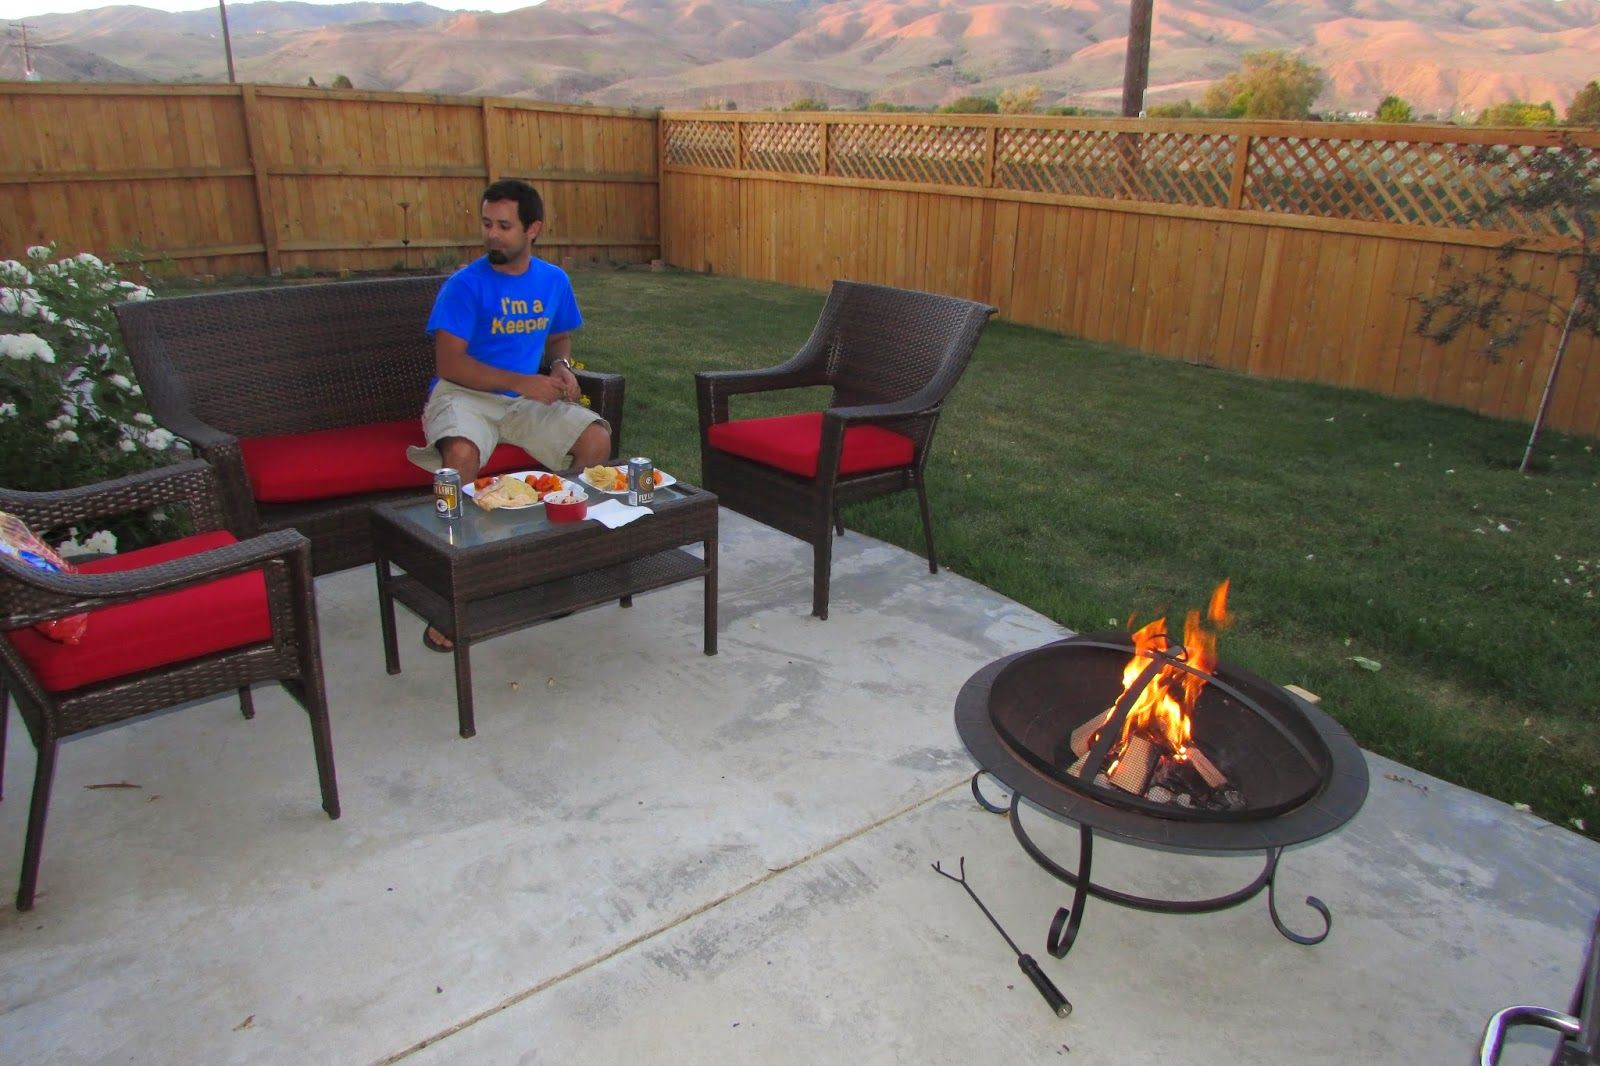 Fred Meyer patio set & fire pit   Fire pit, Fire pit patio ...